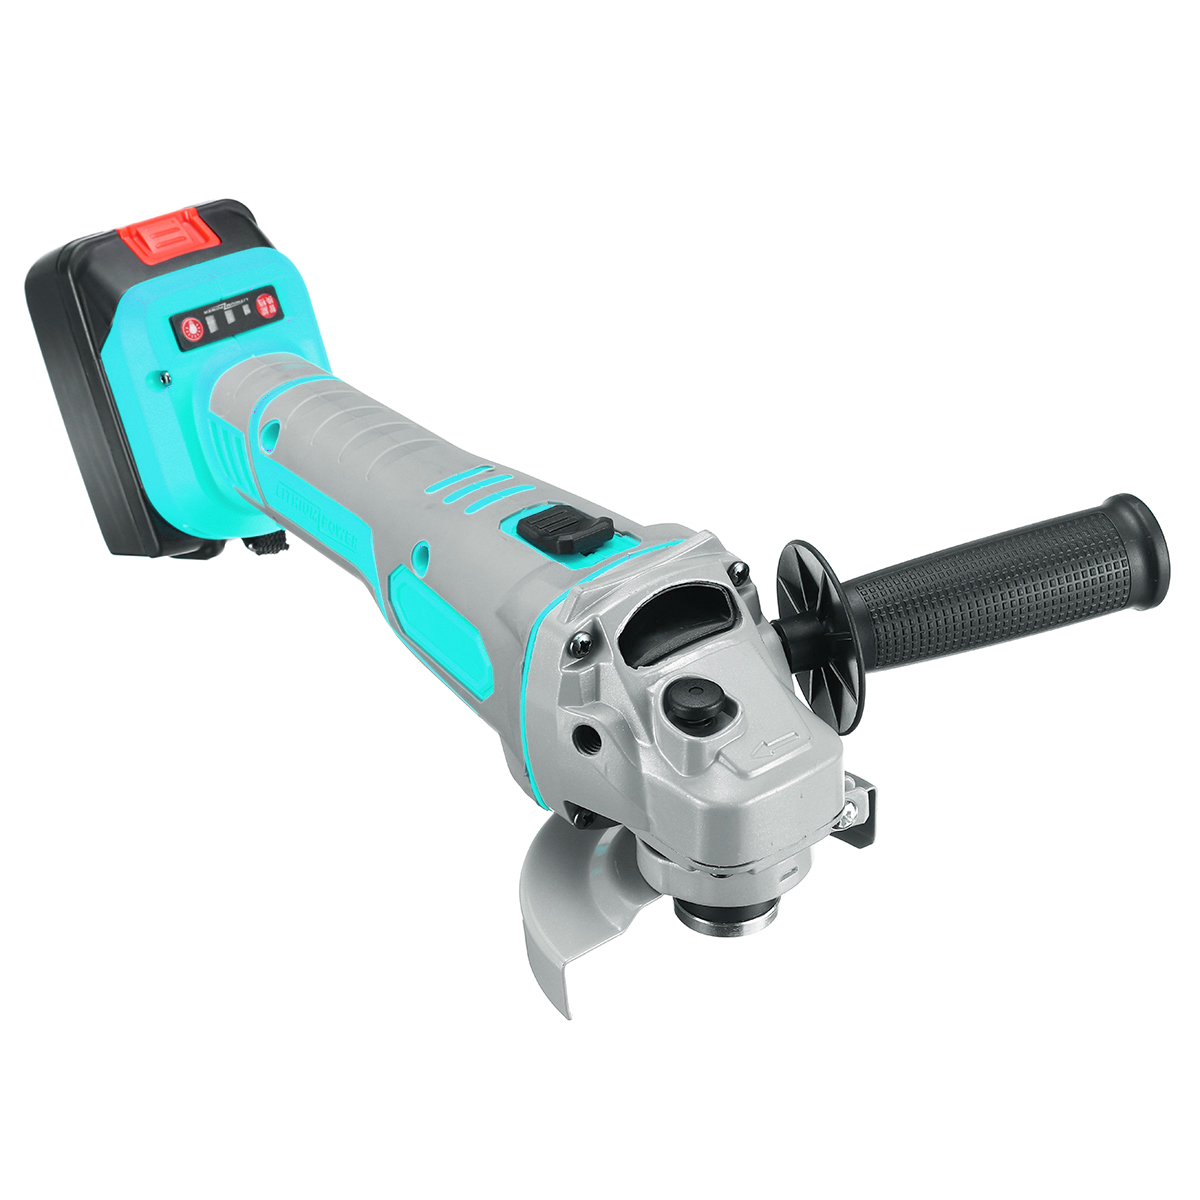 188VF/218VF Brushless Electric Angle Grinder Cordless Polisher Polishing Machine Cutting Tool Set W/ 1 or 2 Li-ion Battery